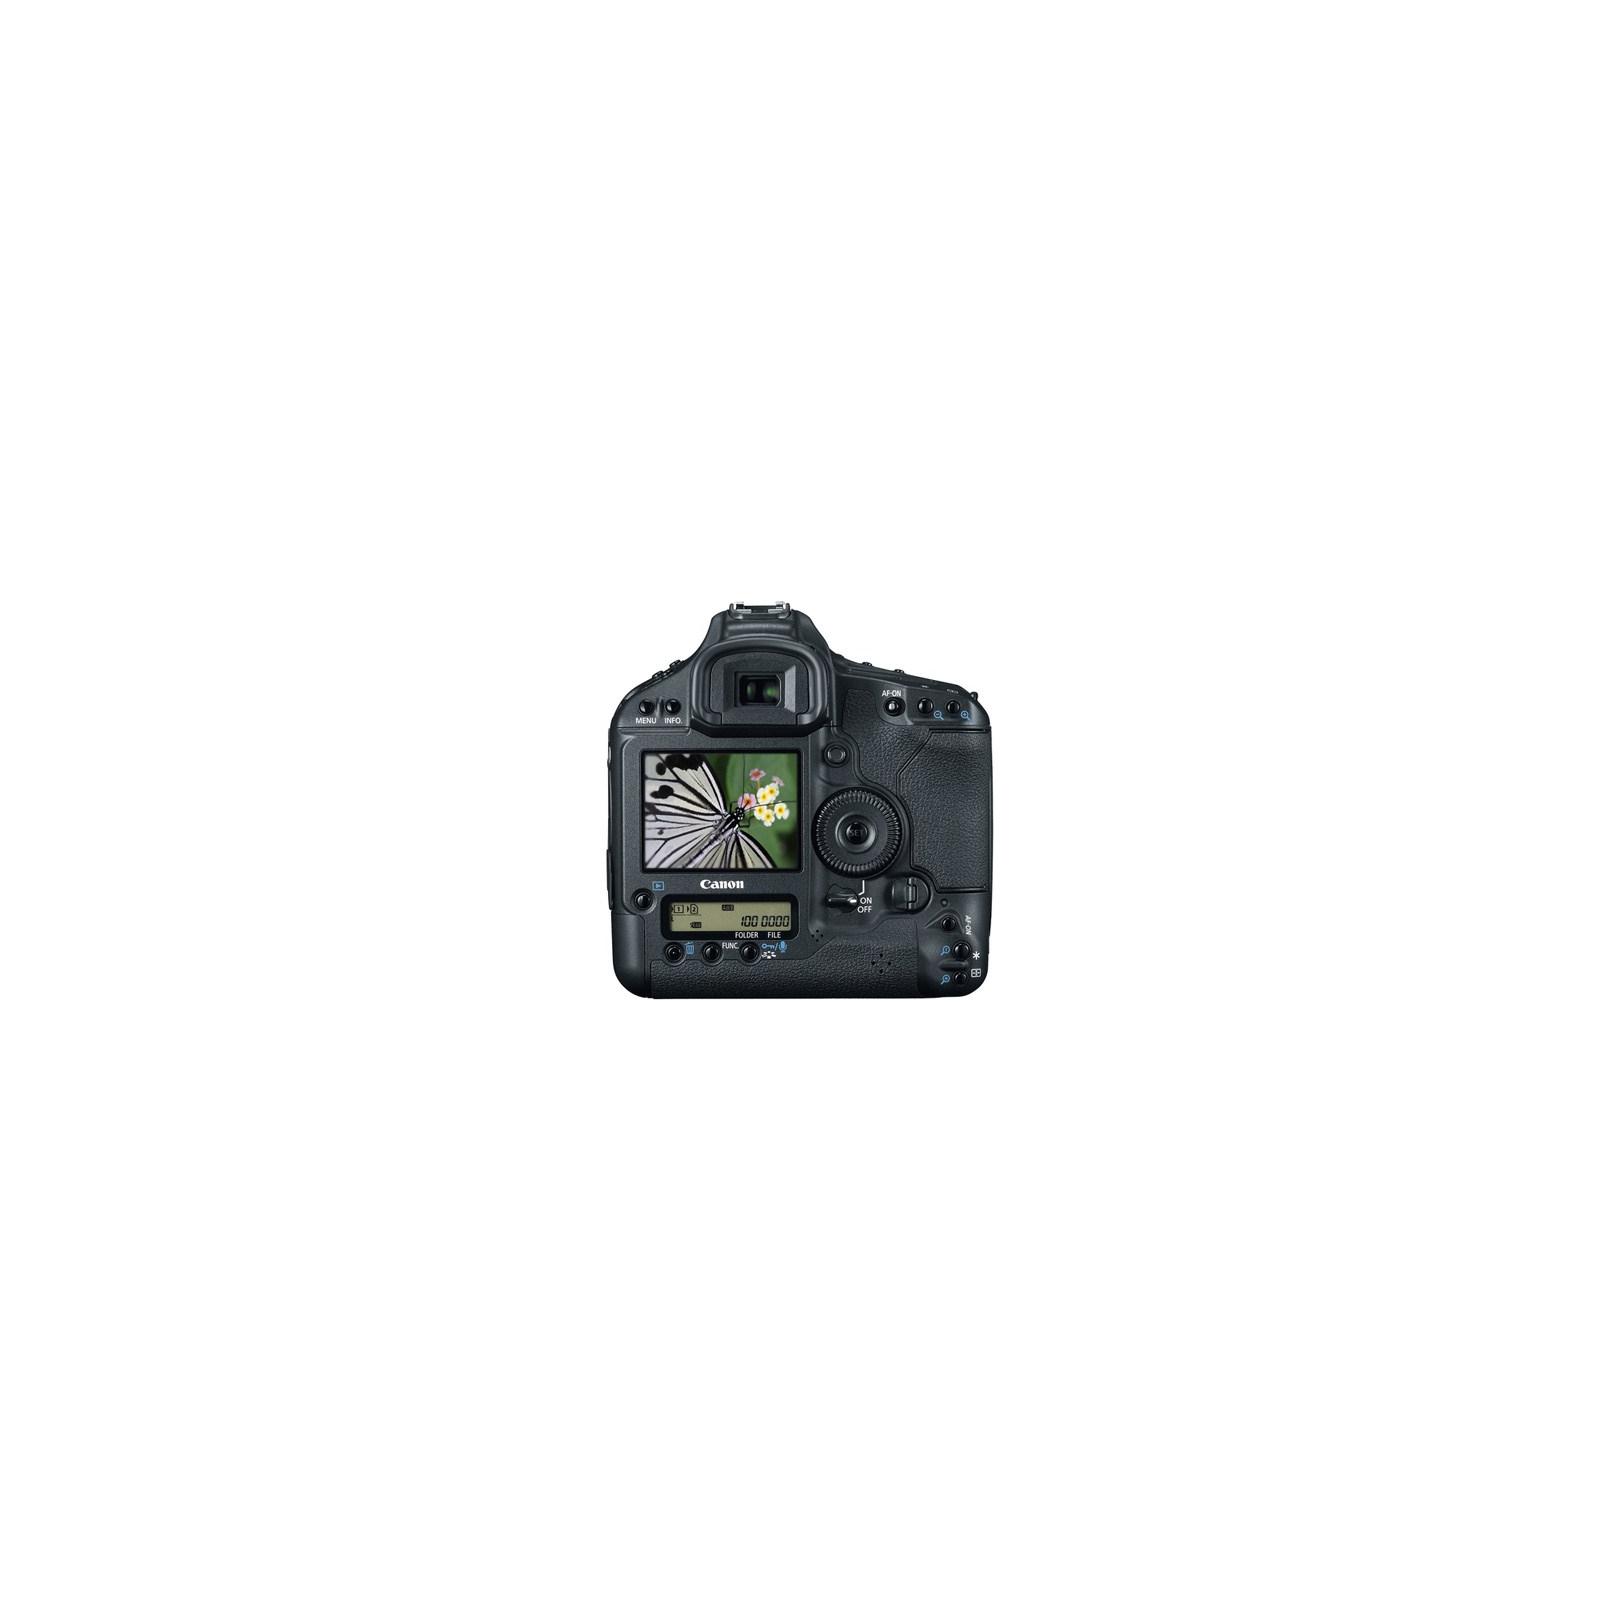 Цифровой фотоаппарат EOS 1D Mark IV body Canon (3822B020) изображение 2